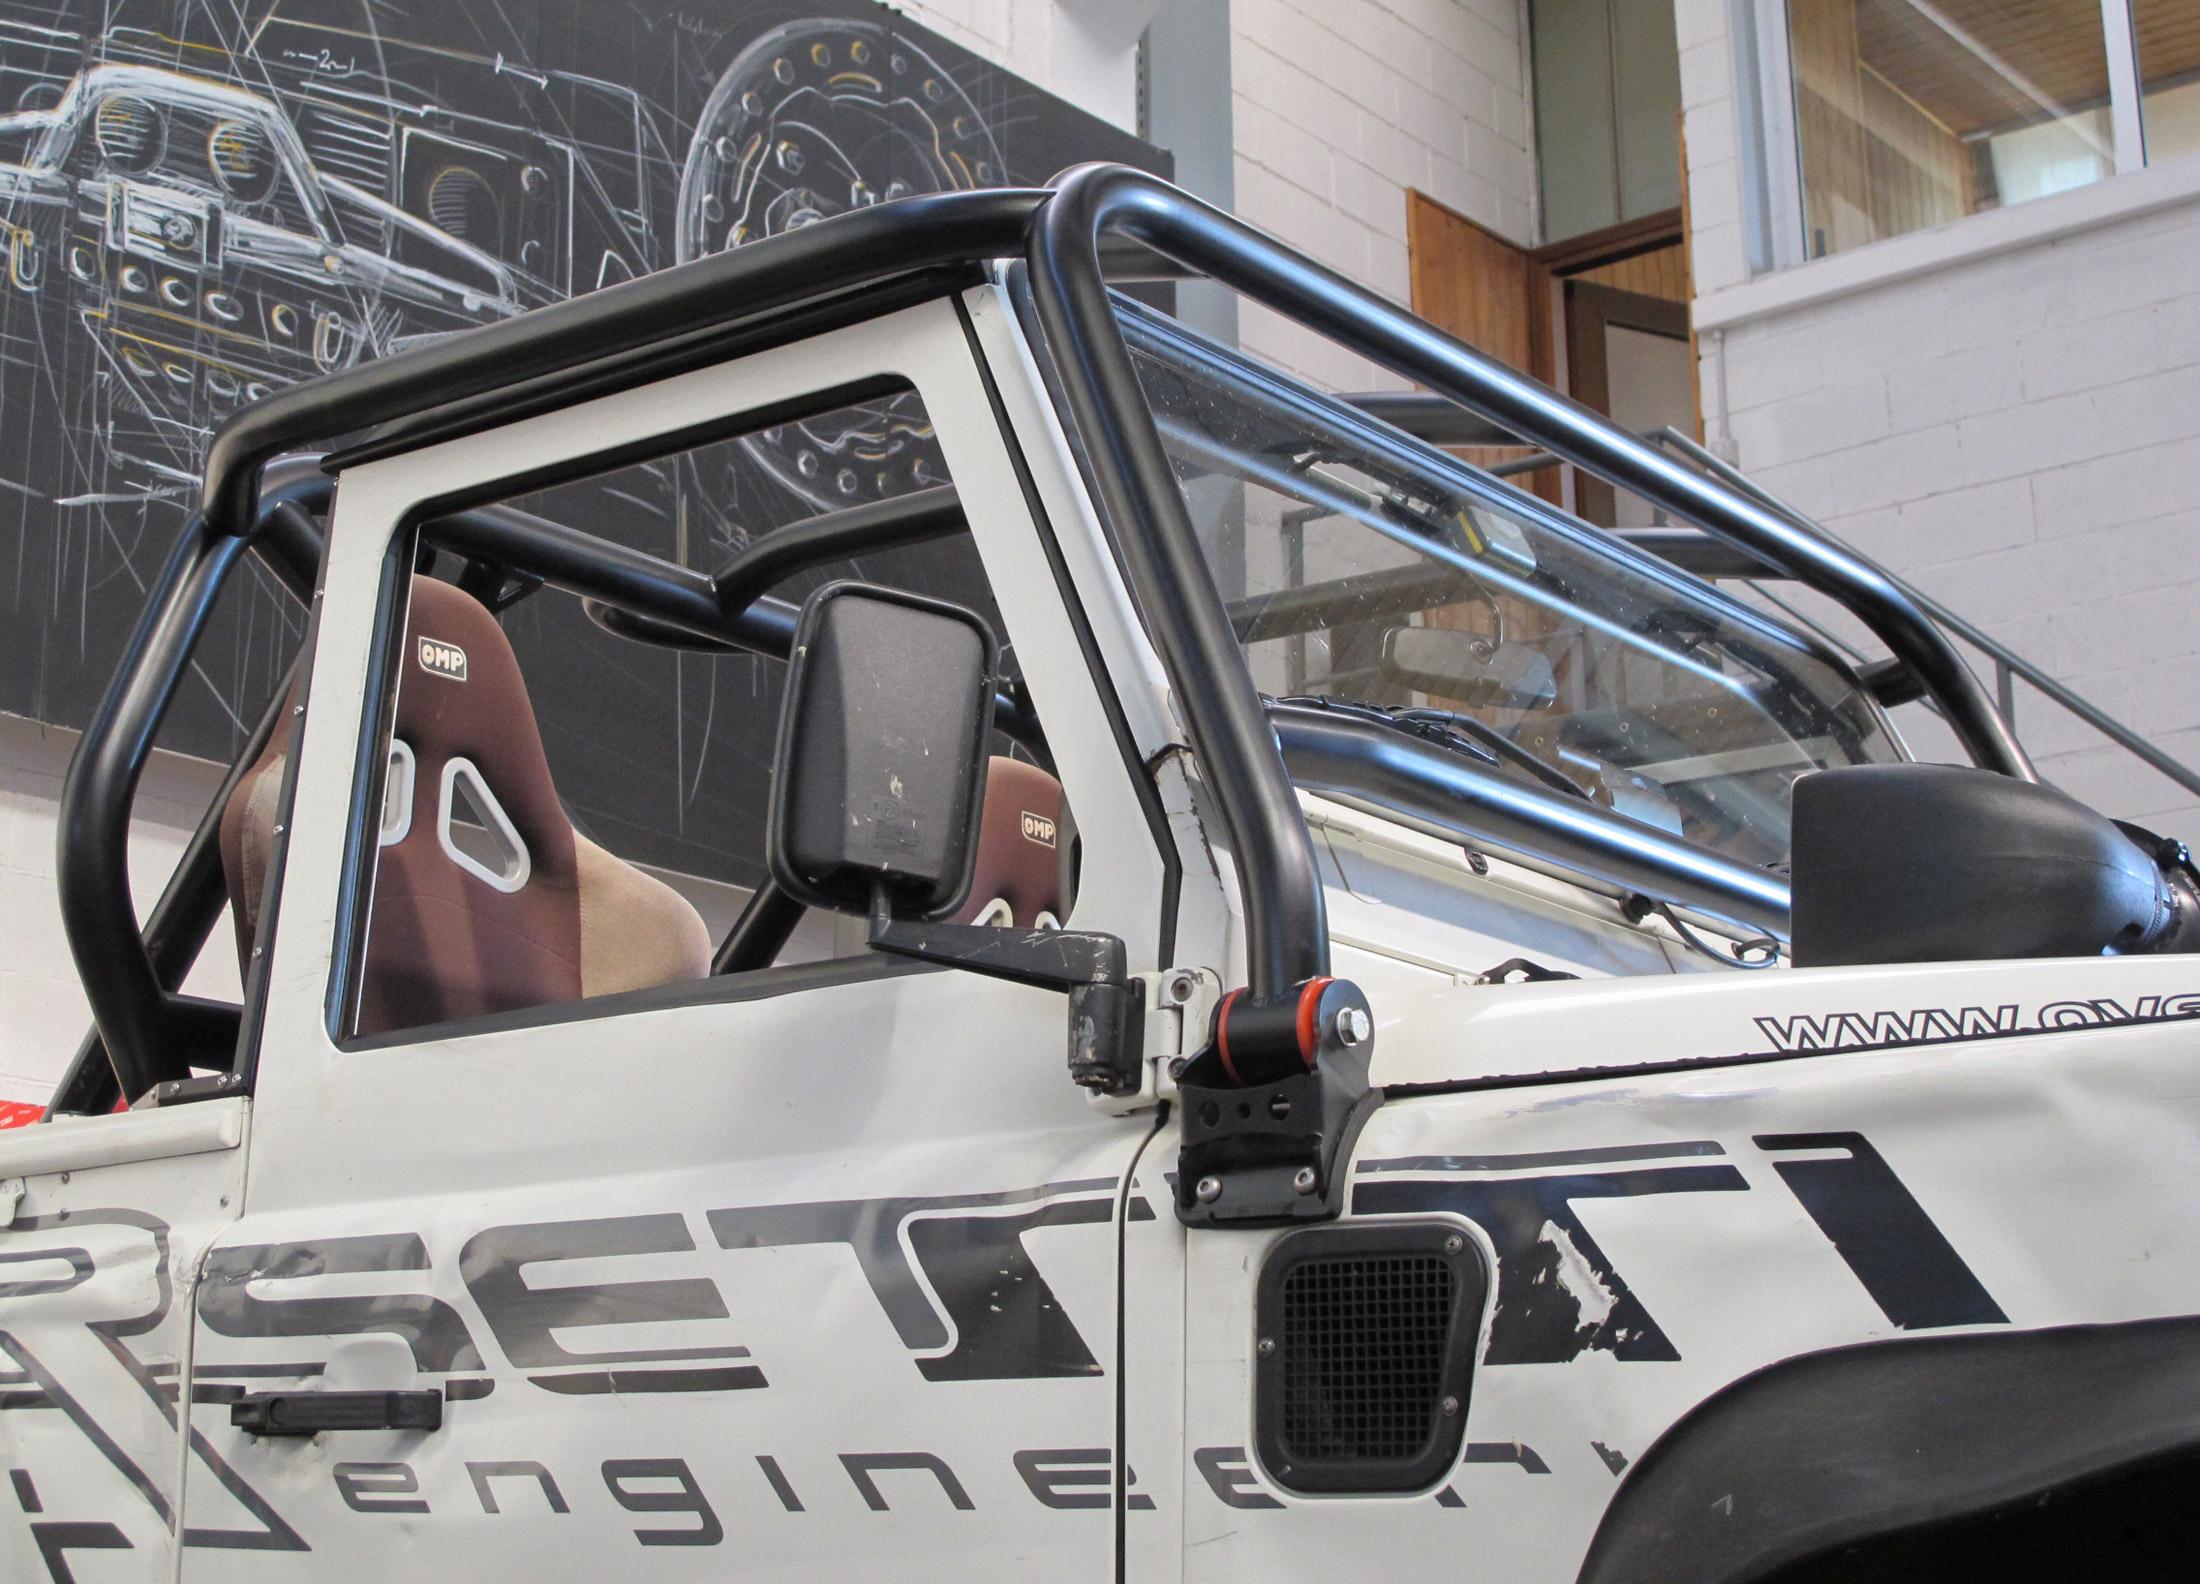 Defender Roll Cage Kit >> COR4 Roll Cage Defender 90 pick-up - LRS Offroad